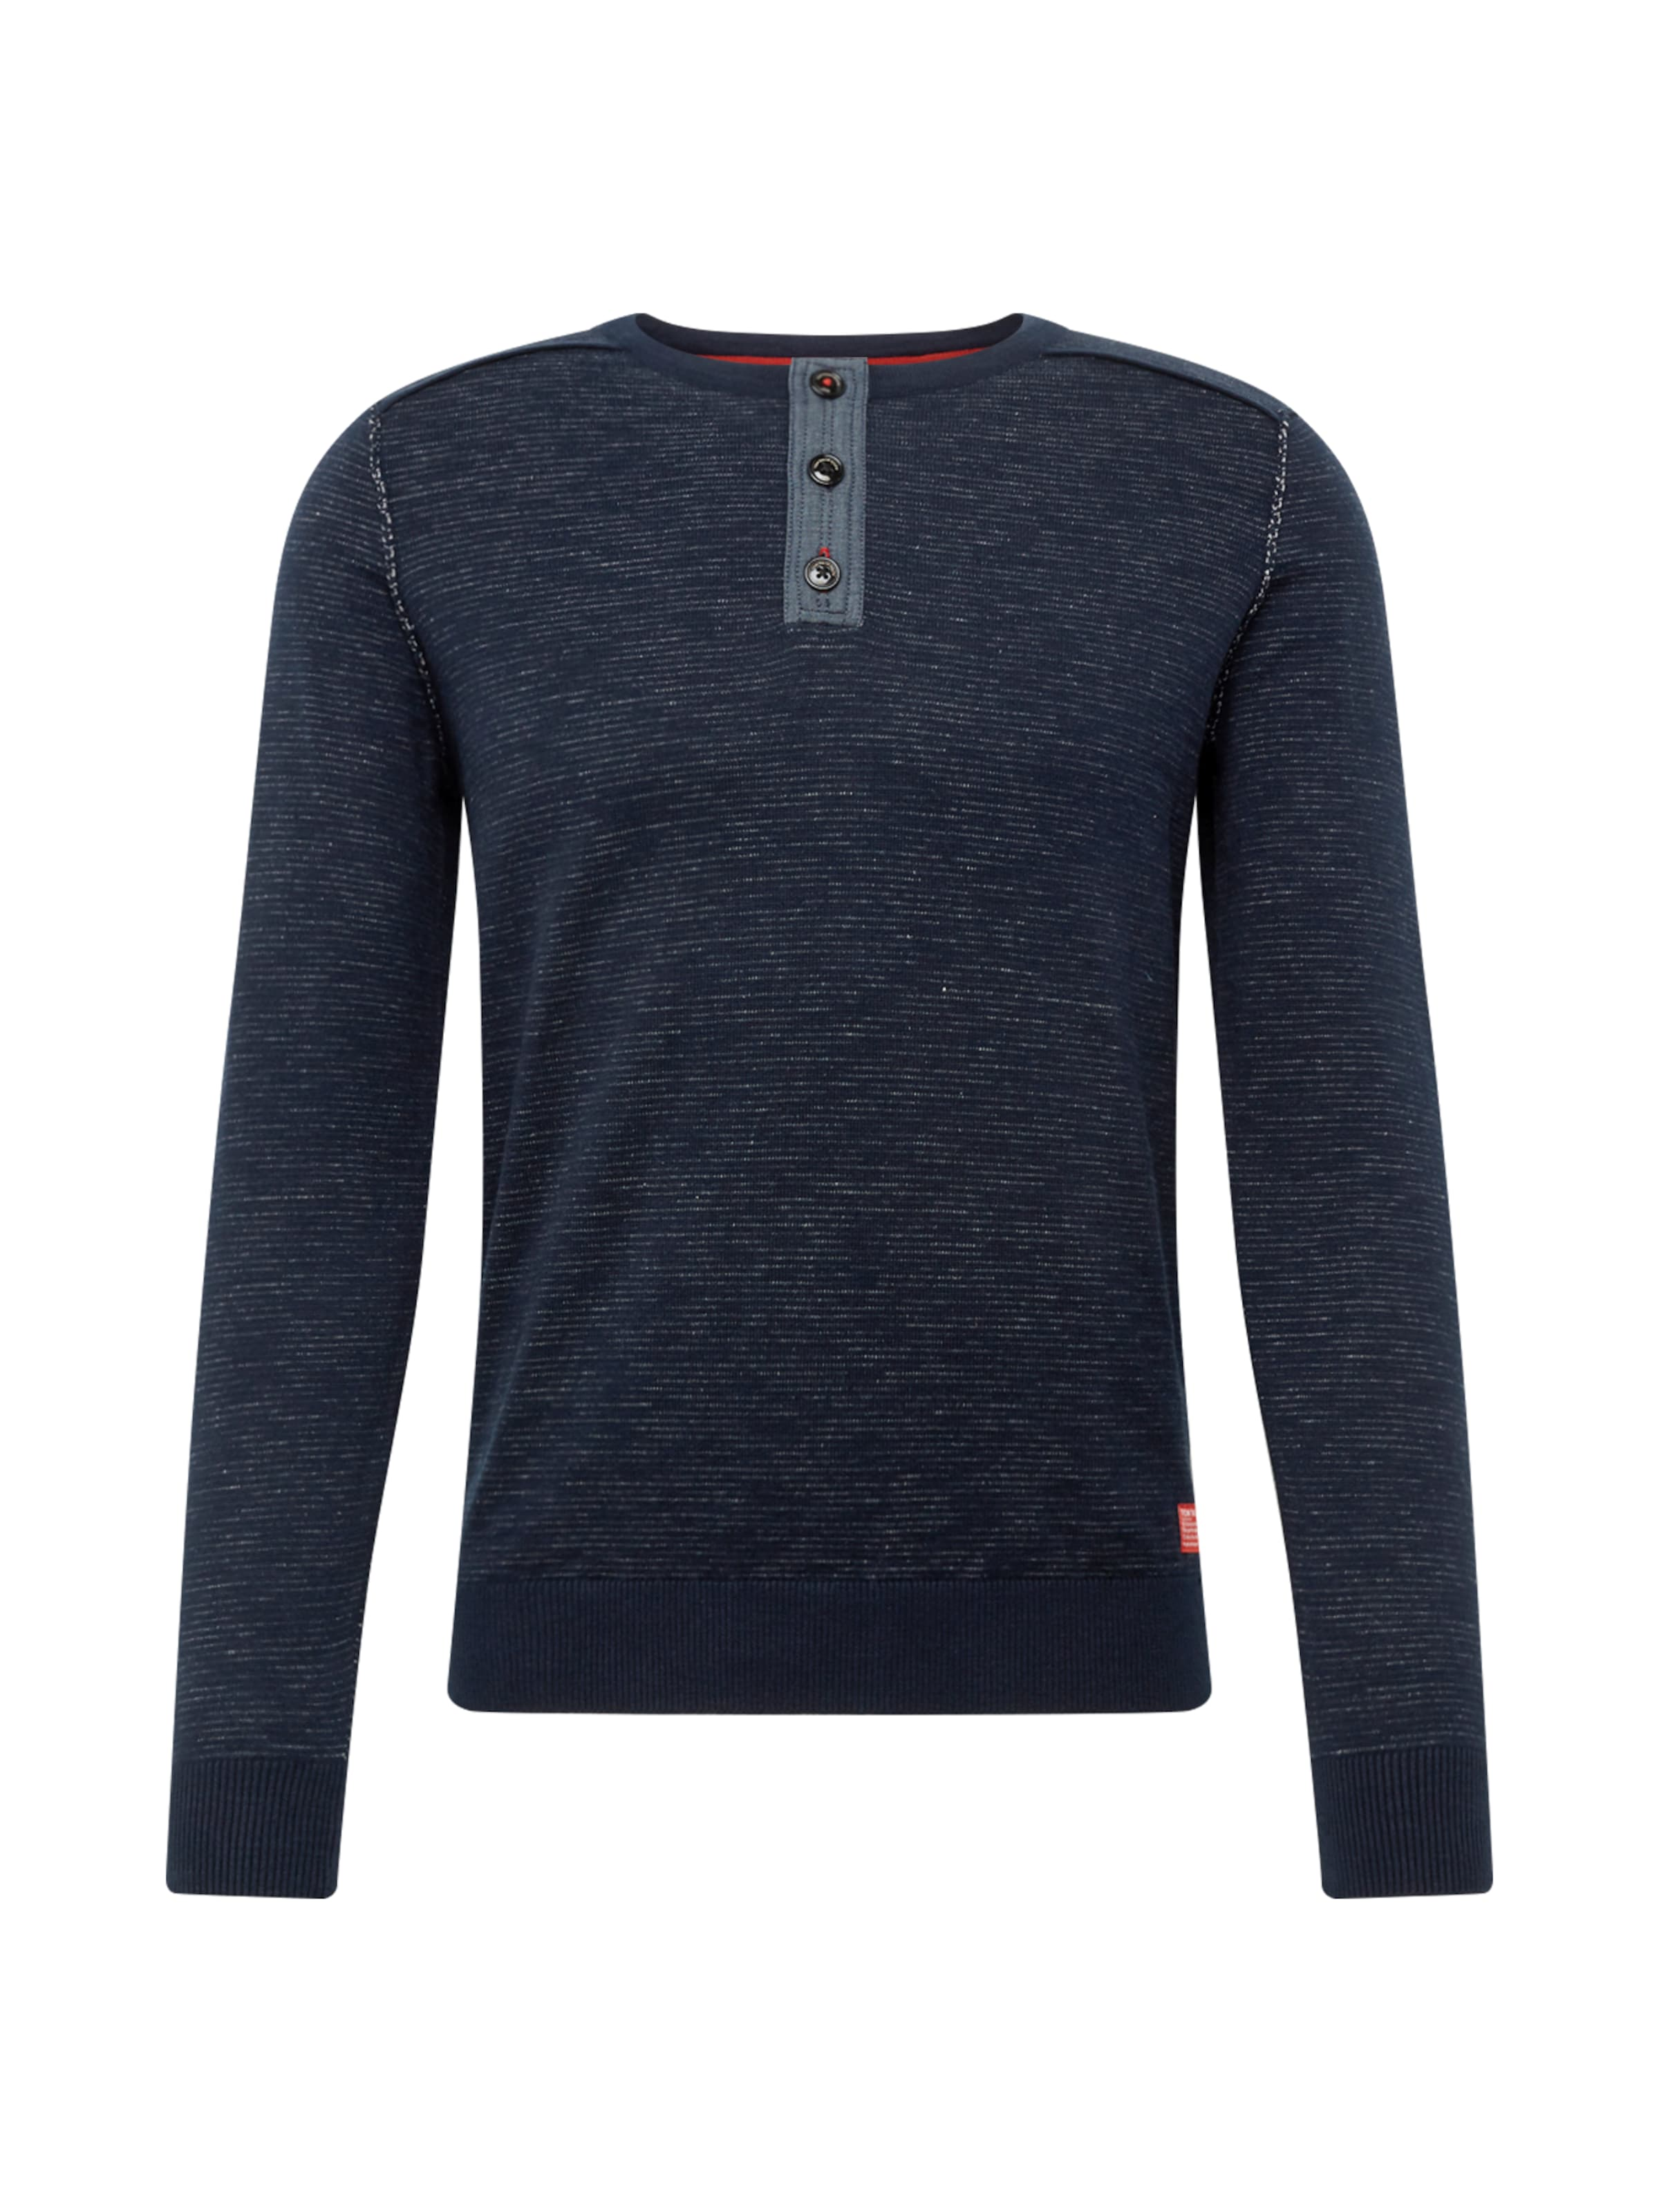 shirt Tom T Bleu MarineBlanc Tailor En qGSzUMVp